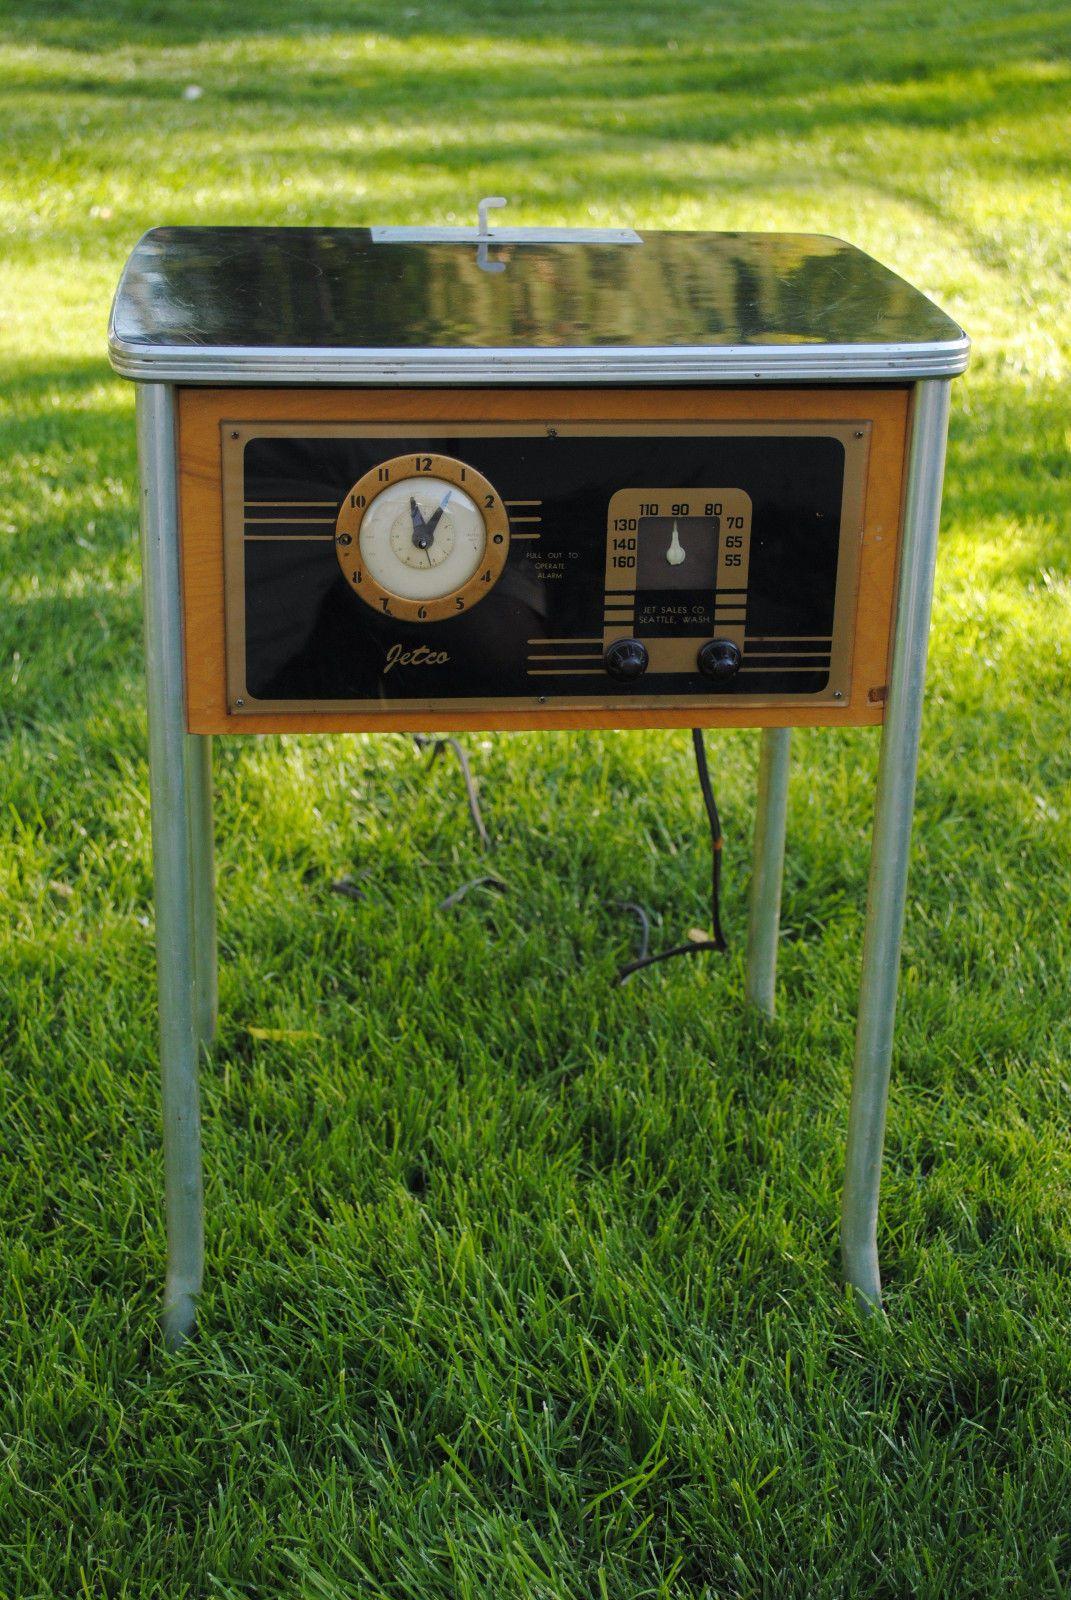 Jetco Motel Radio 1940 1950 1 Dime 1 Hour RARE Black Art Deco Vintage PL 12